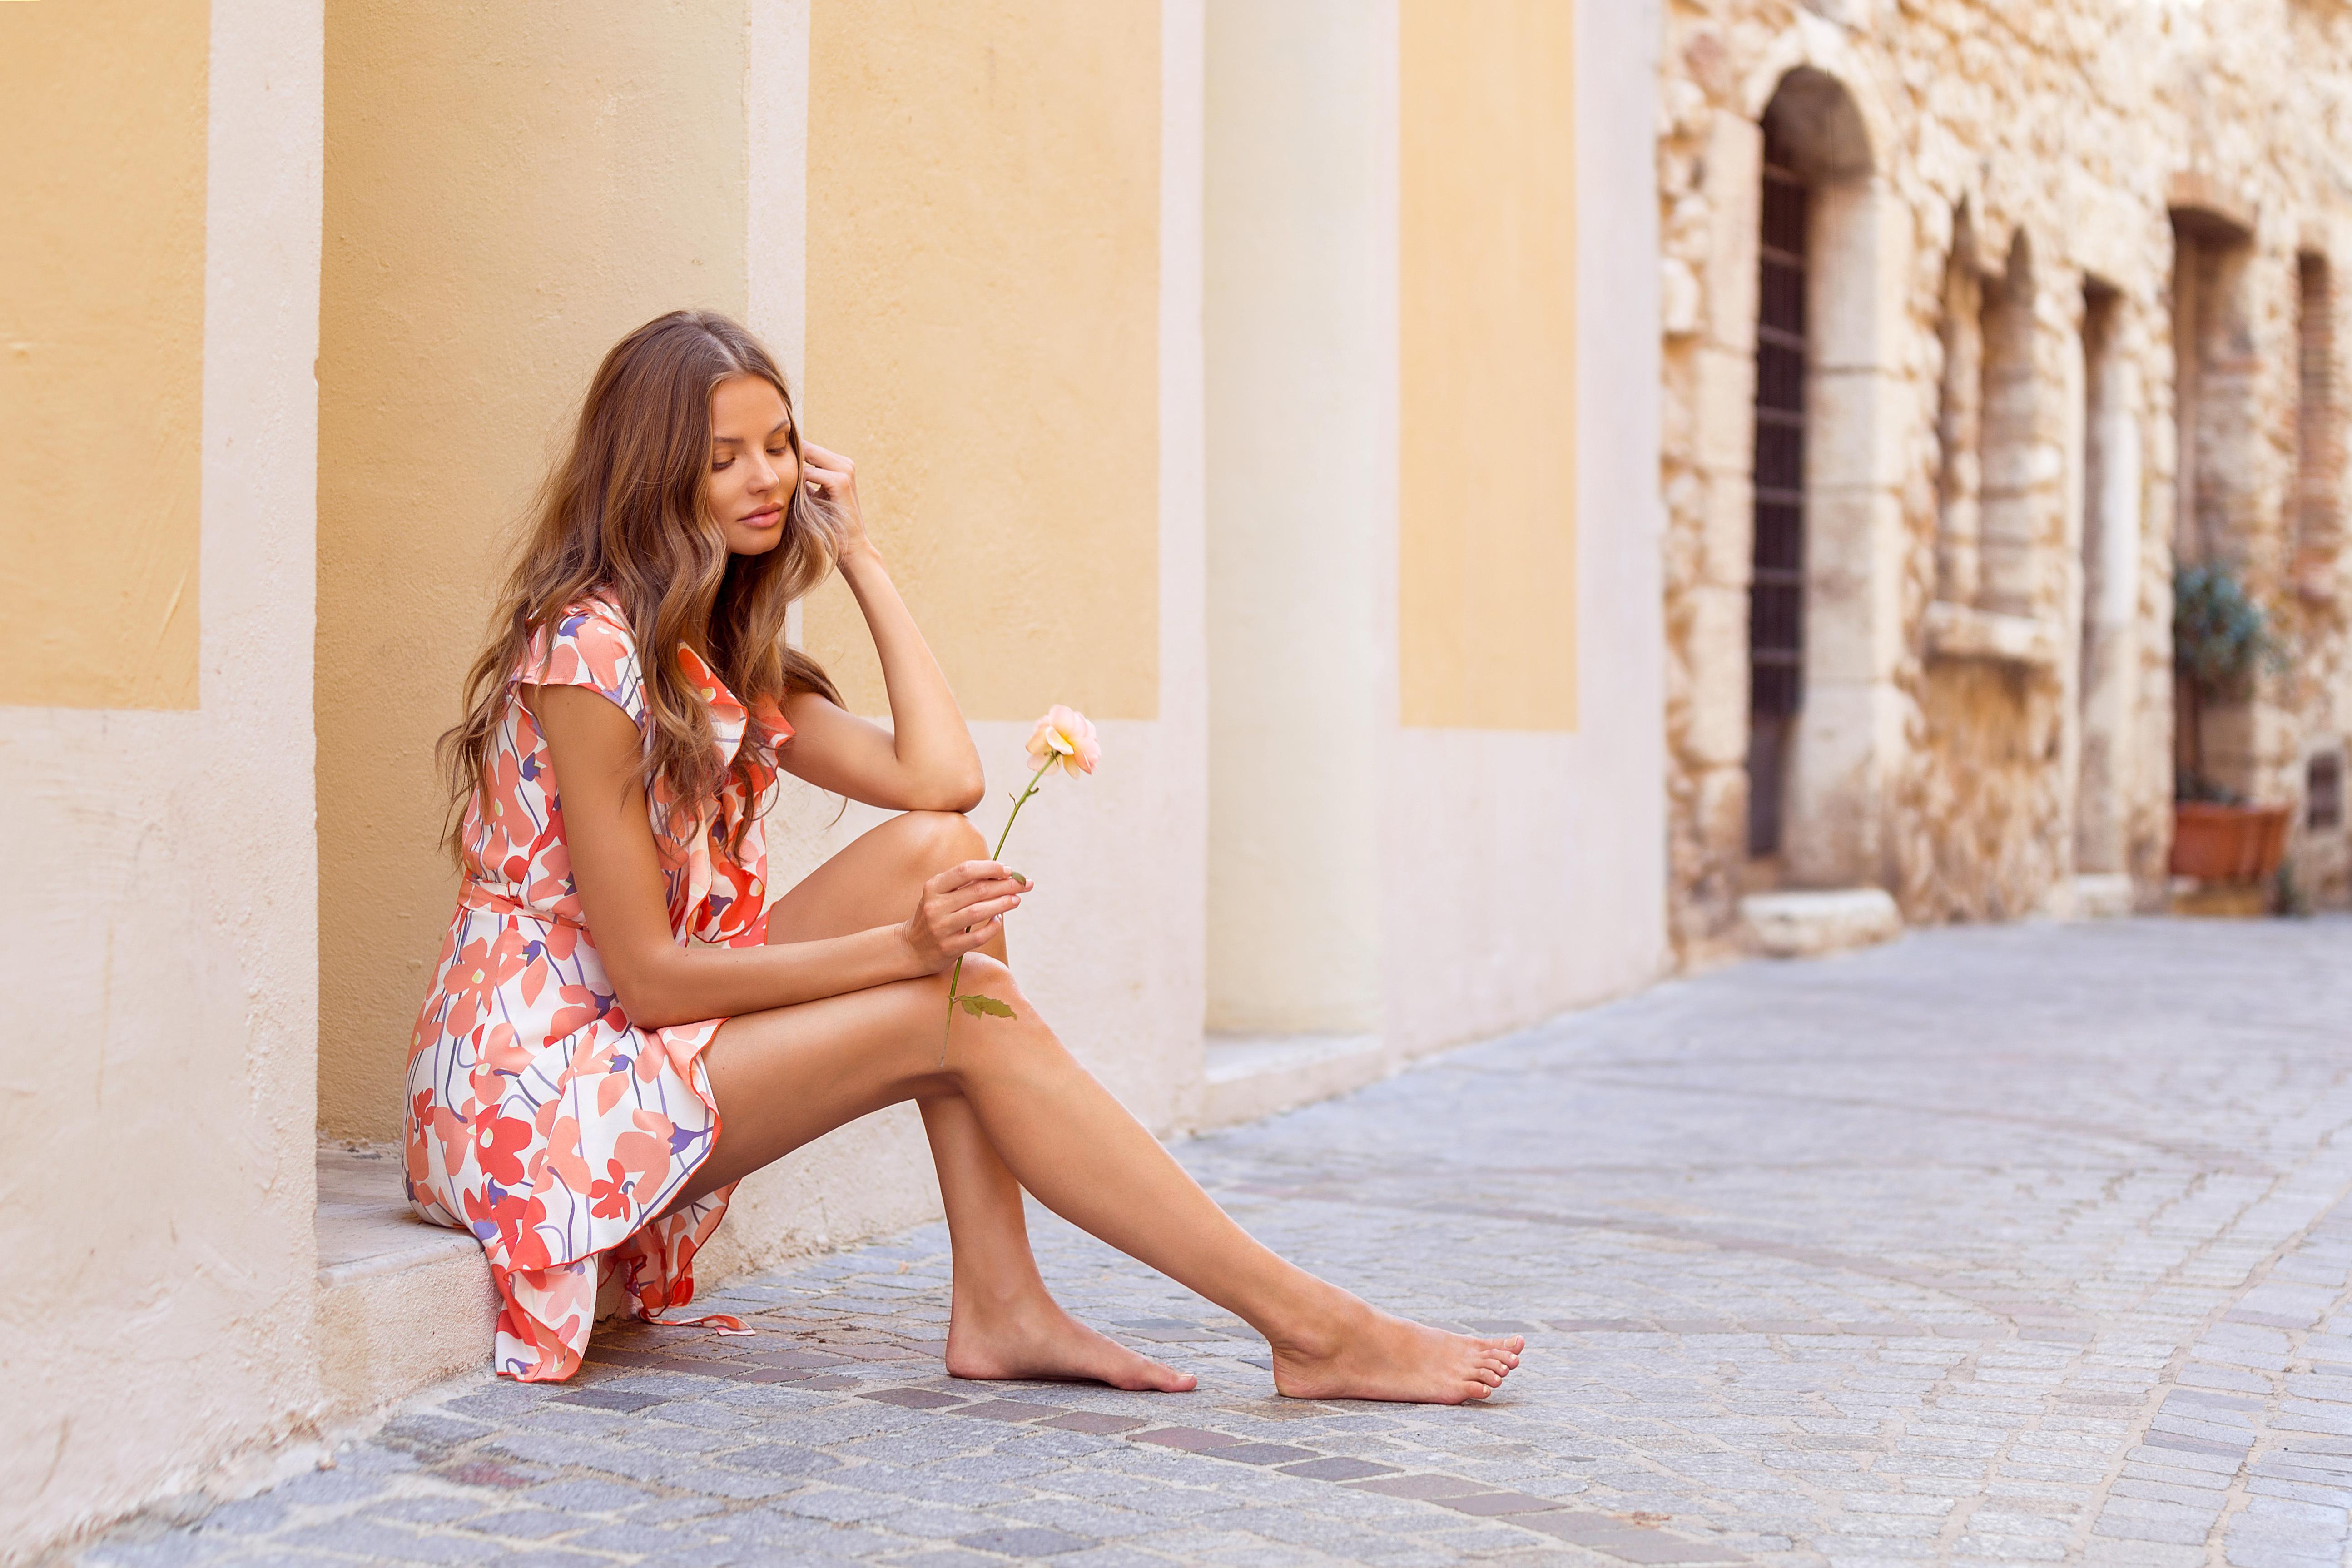 Feet Magdalena Frackowiak nudes (38 photo), Sexy, Paparazzi, Twitter, in bikini 2019